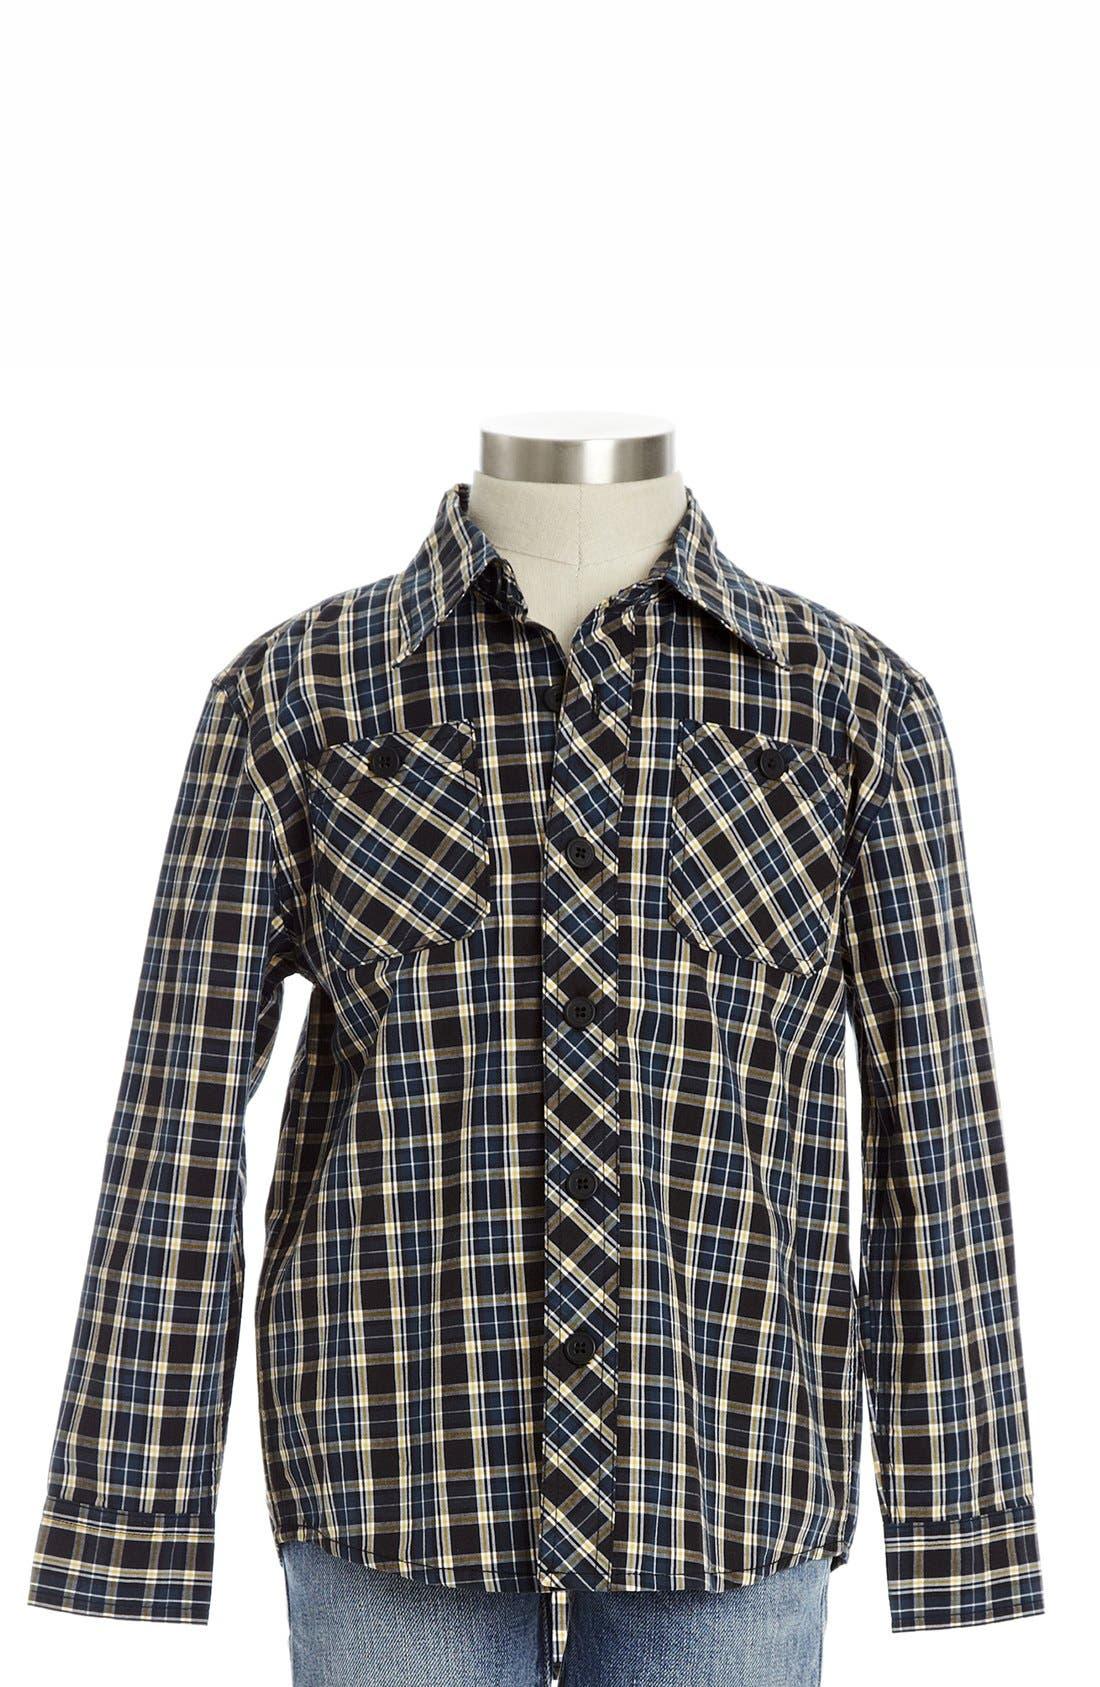 Main Image - Peek 'Costas' Utility Shirt (Toddler Boys, Little Boys & Big Boys)